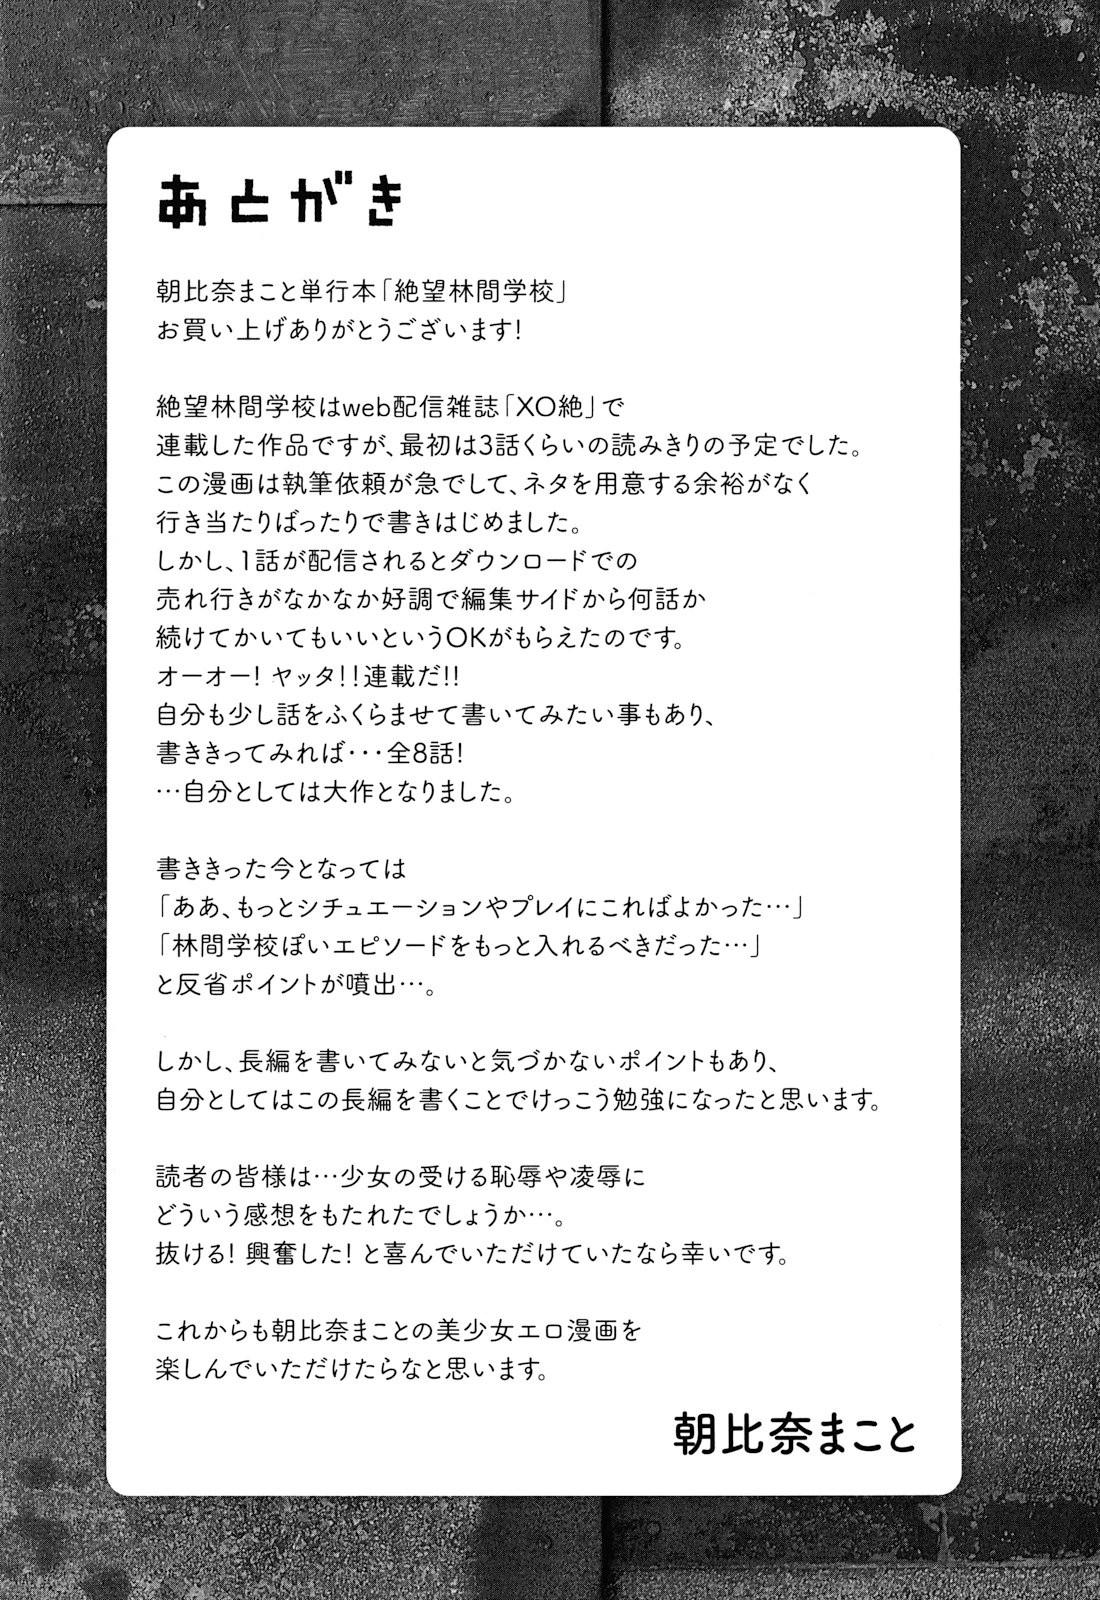 Zetsubou Rinkan Gakkou 181